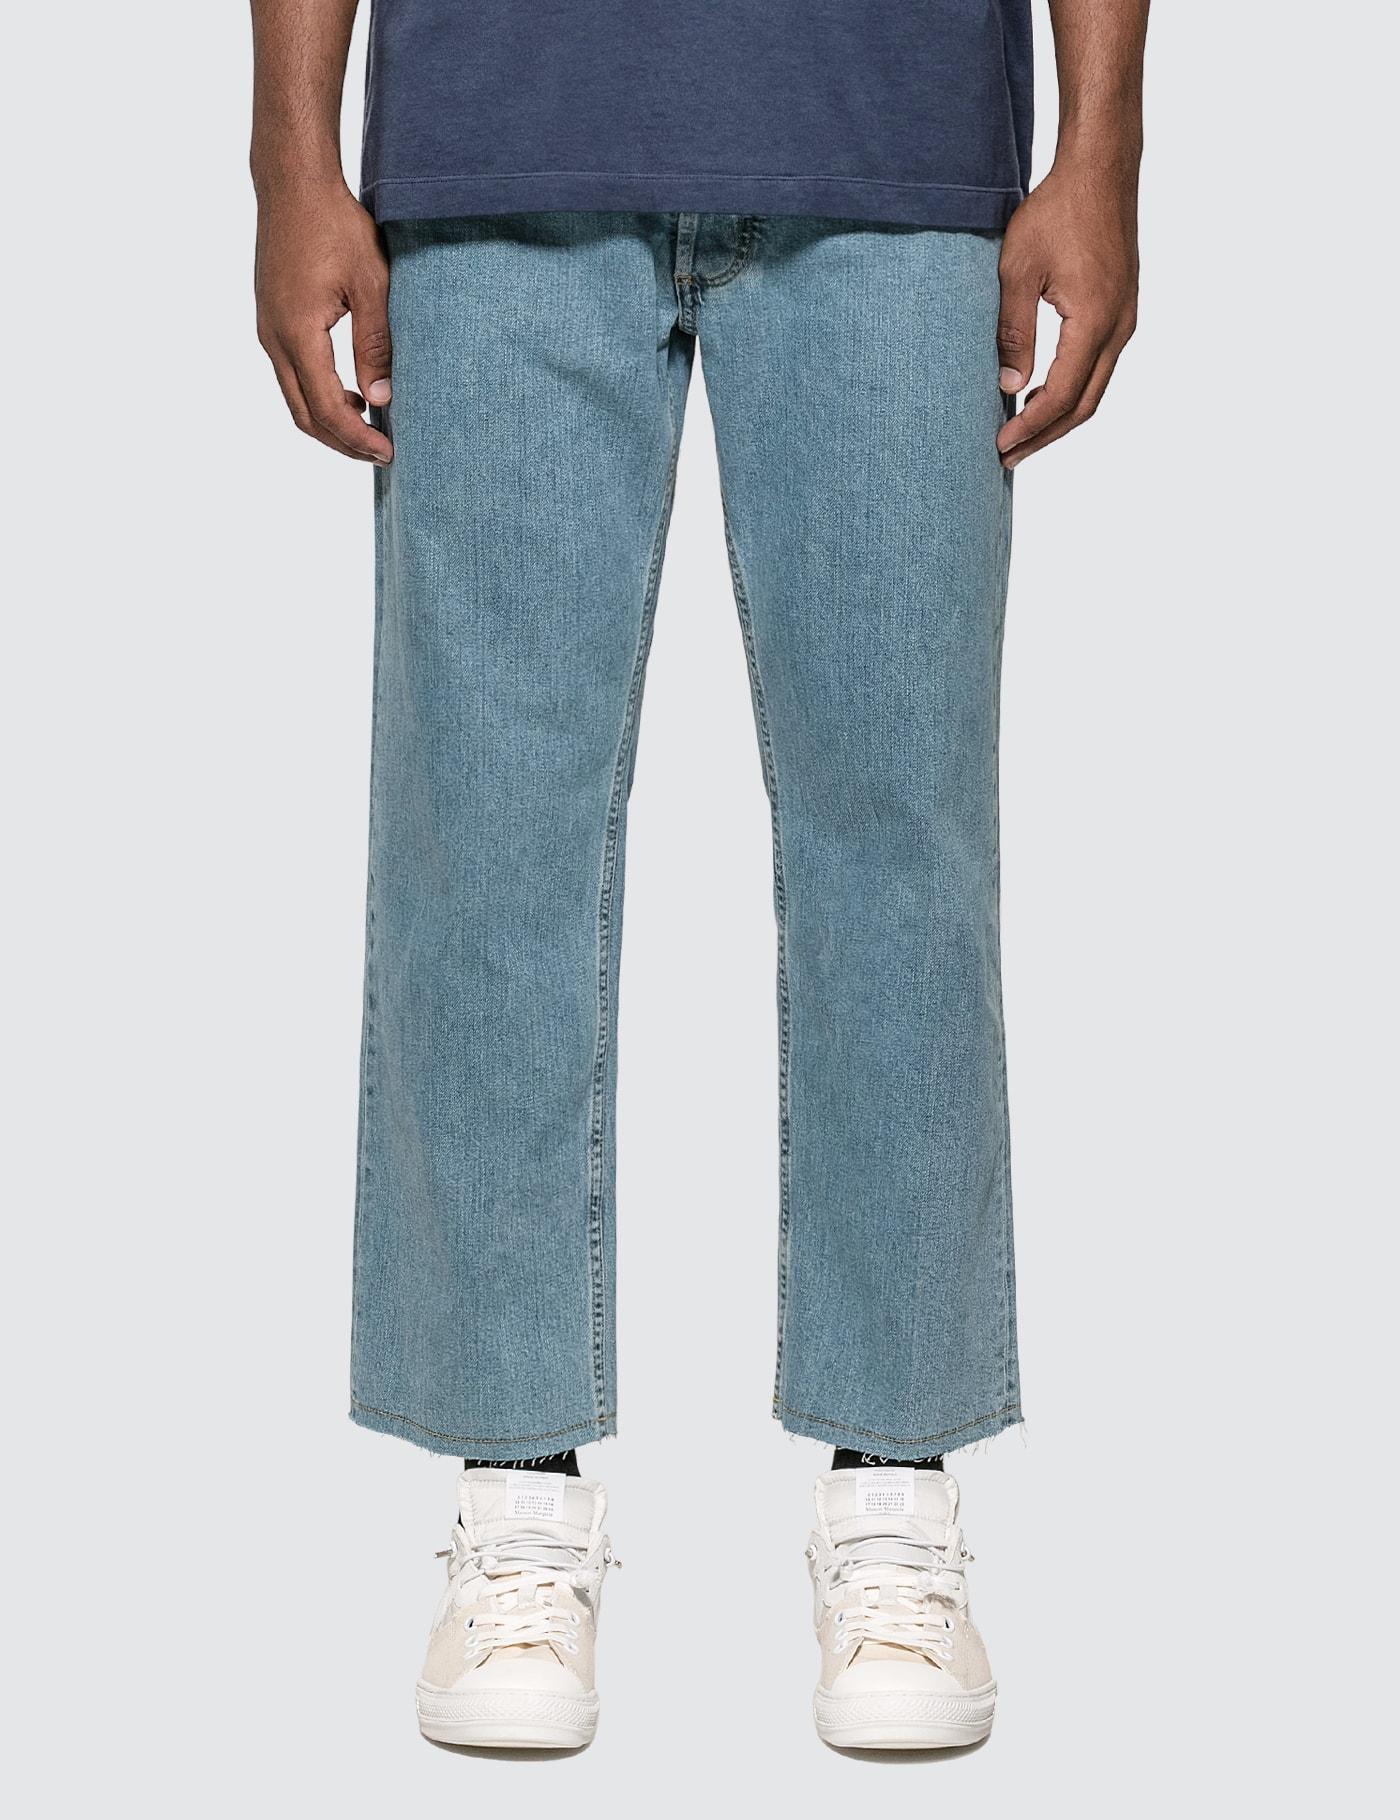 5 Pockets Denim Jeans